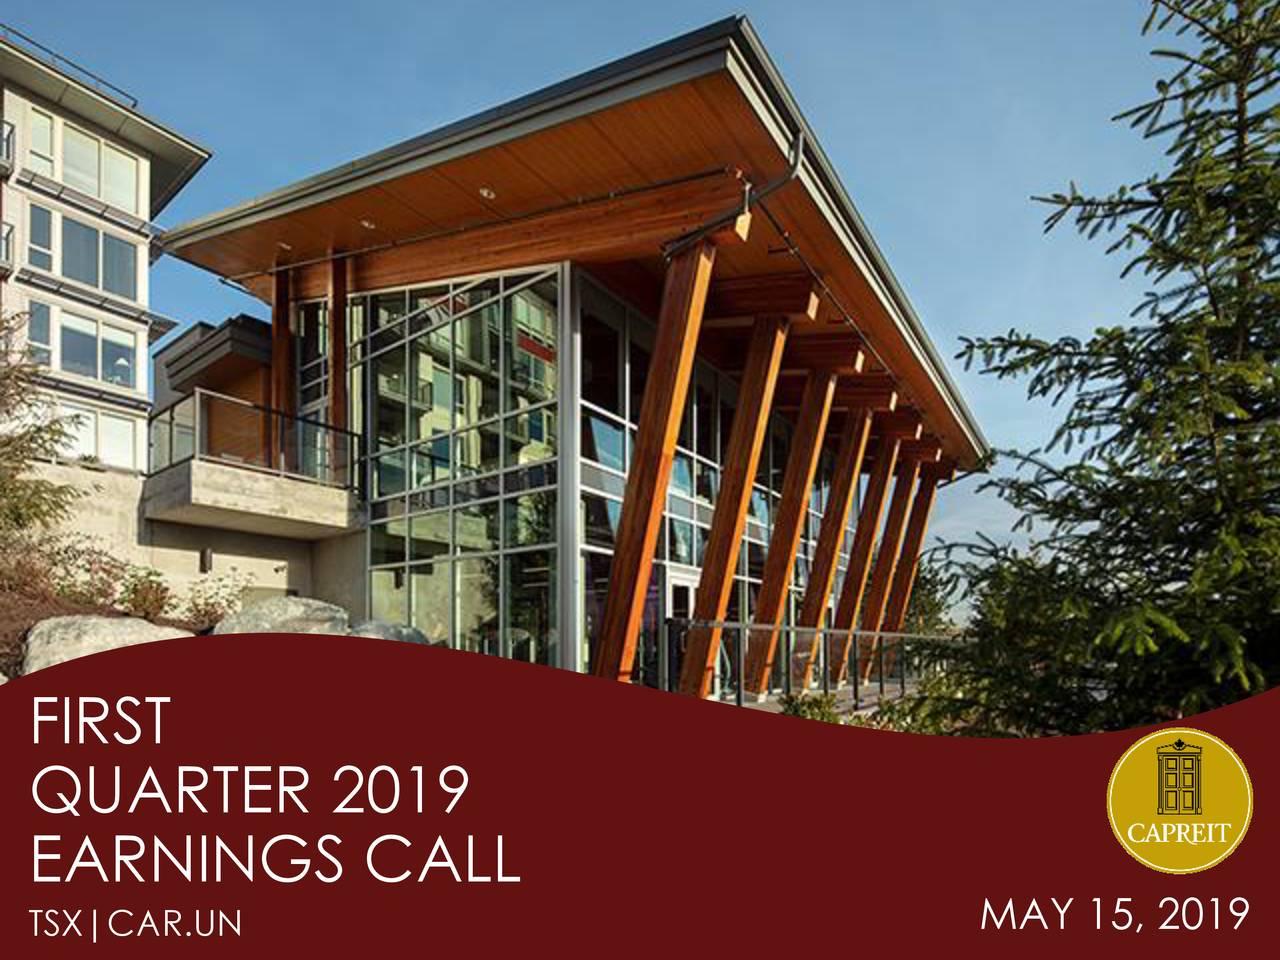 QUARTER 2019 EARNINGS CALL MAY 15, 2019